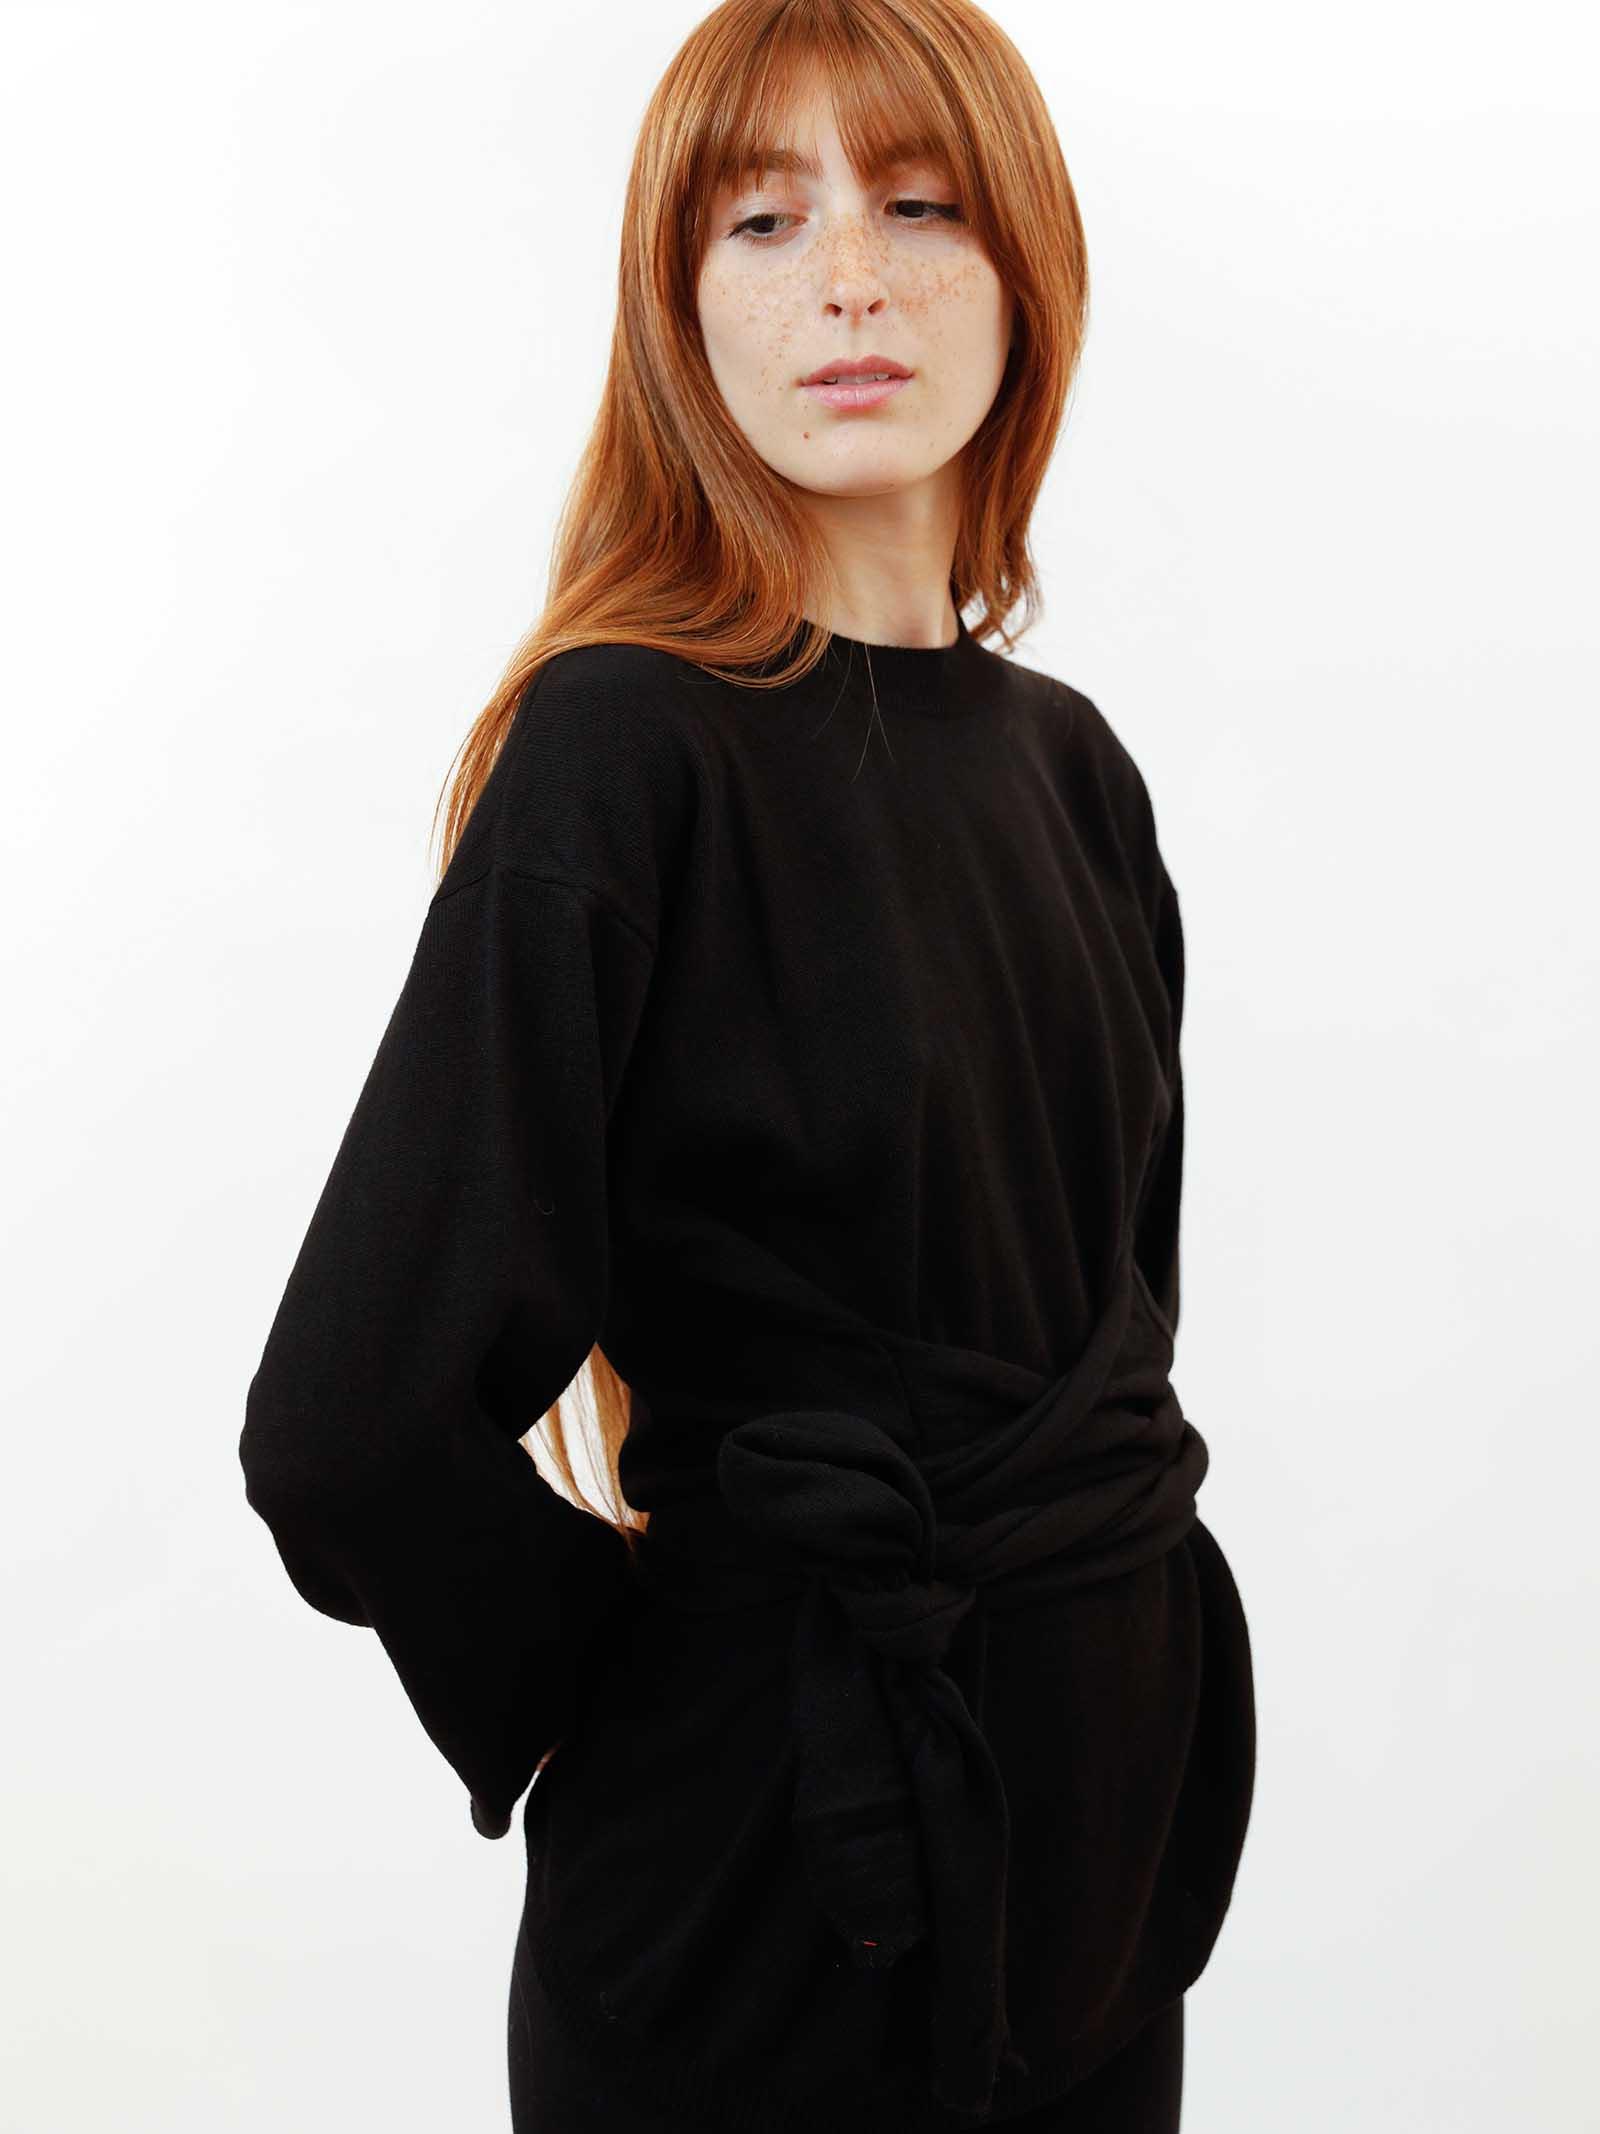 Women's Clothing Re-volution Sweater in Black Wool Crew-Neck with Matching Waist Belt Maliparmi | Knitwear | JQ48987051820000